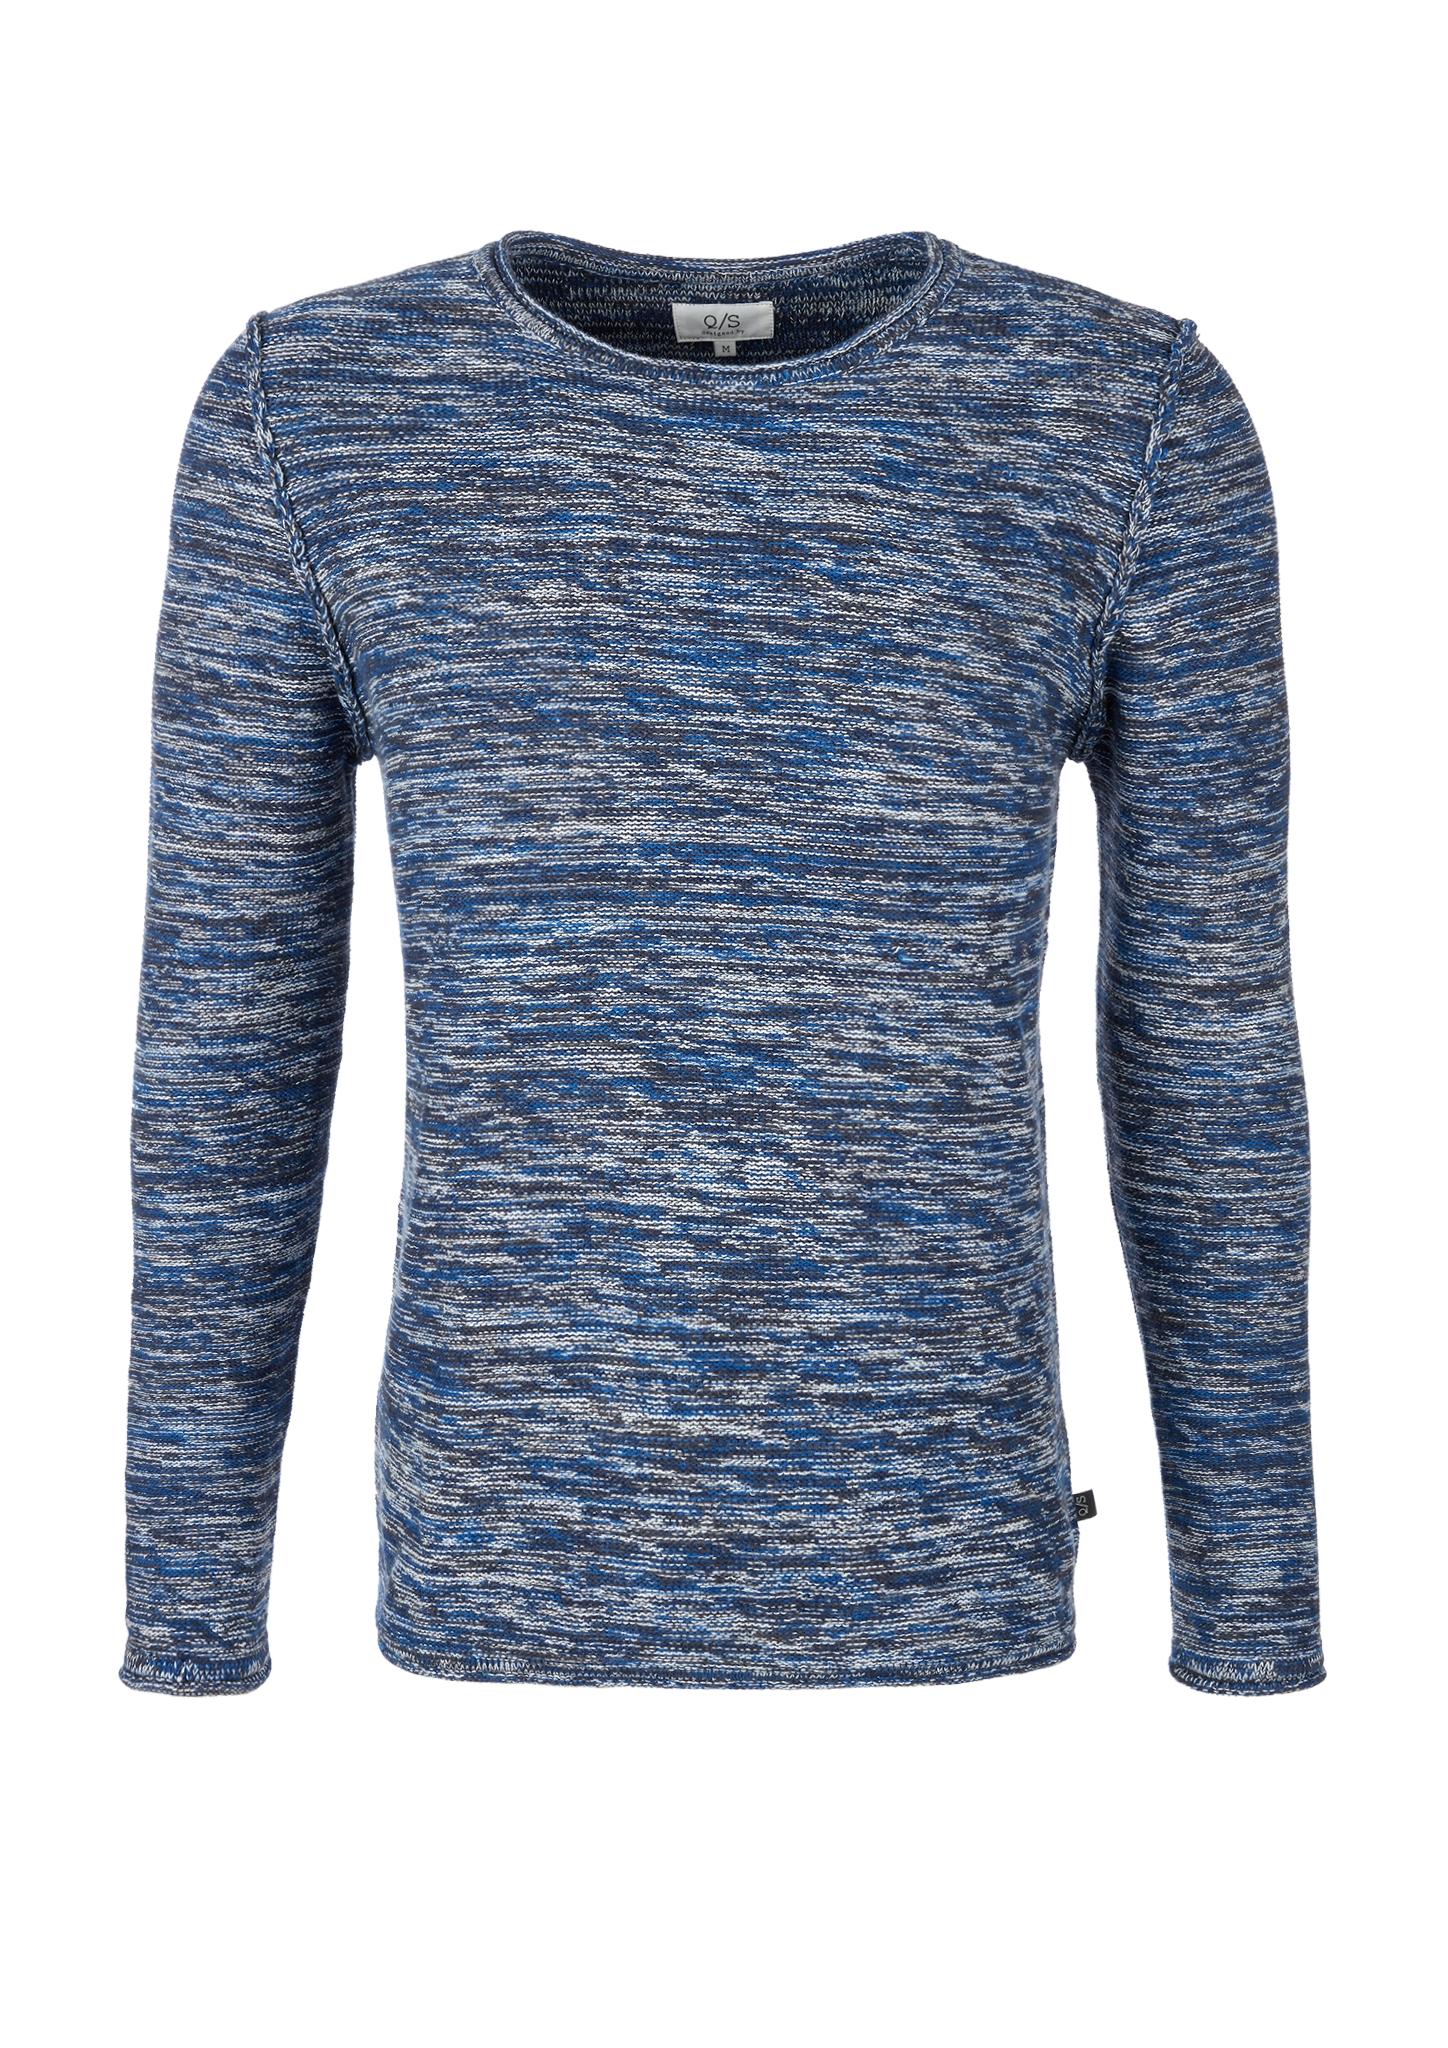 Melange-Pullover   Bekleidung > Pullover > Sonstige Pullover   Blau   100% baumwolle   Q/S designed by